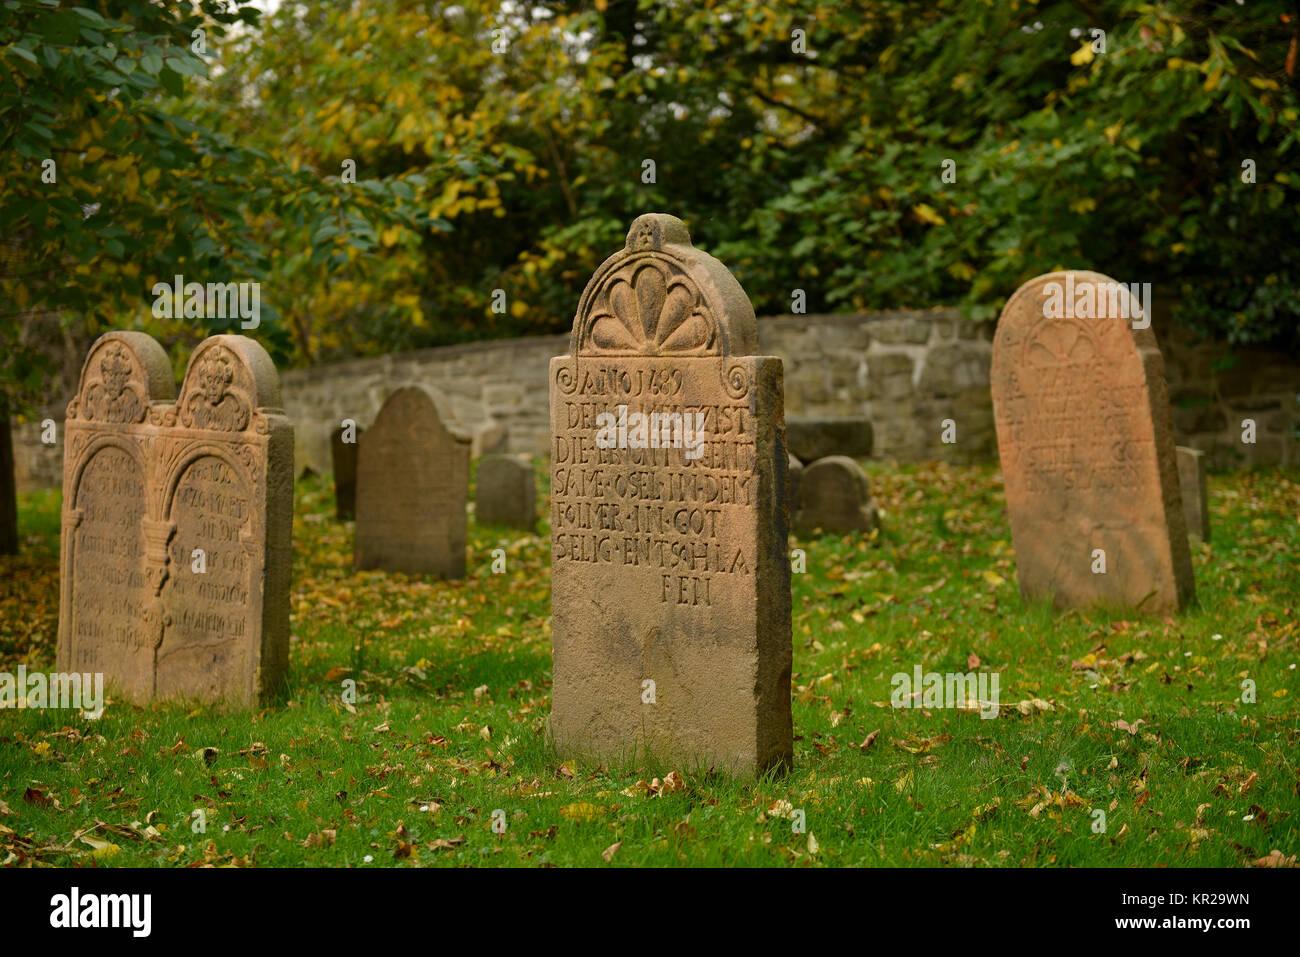 Las lápidas, cementerio Dorfkirche Stiepel, Brockhauser street, Stiepel, Bochum, Renania del Norte-Westfalia, Alemania, Friedhof Dorfkirche Stiepe Grabsteine Foto de stock